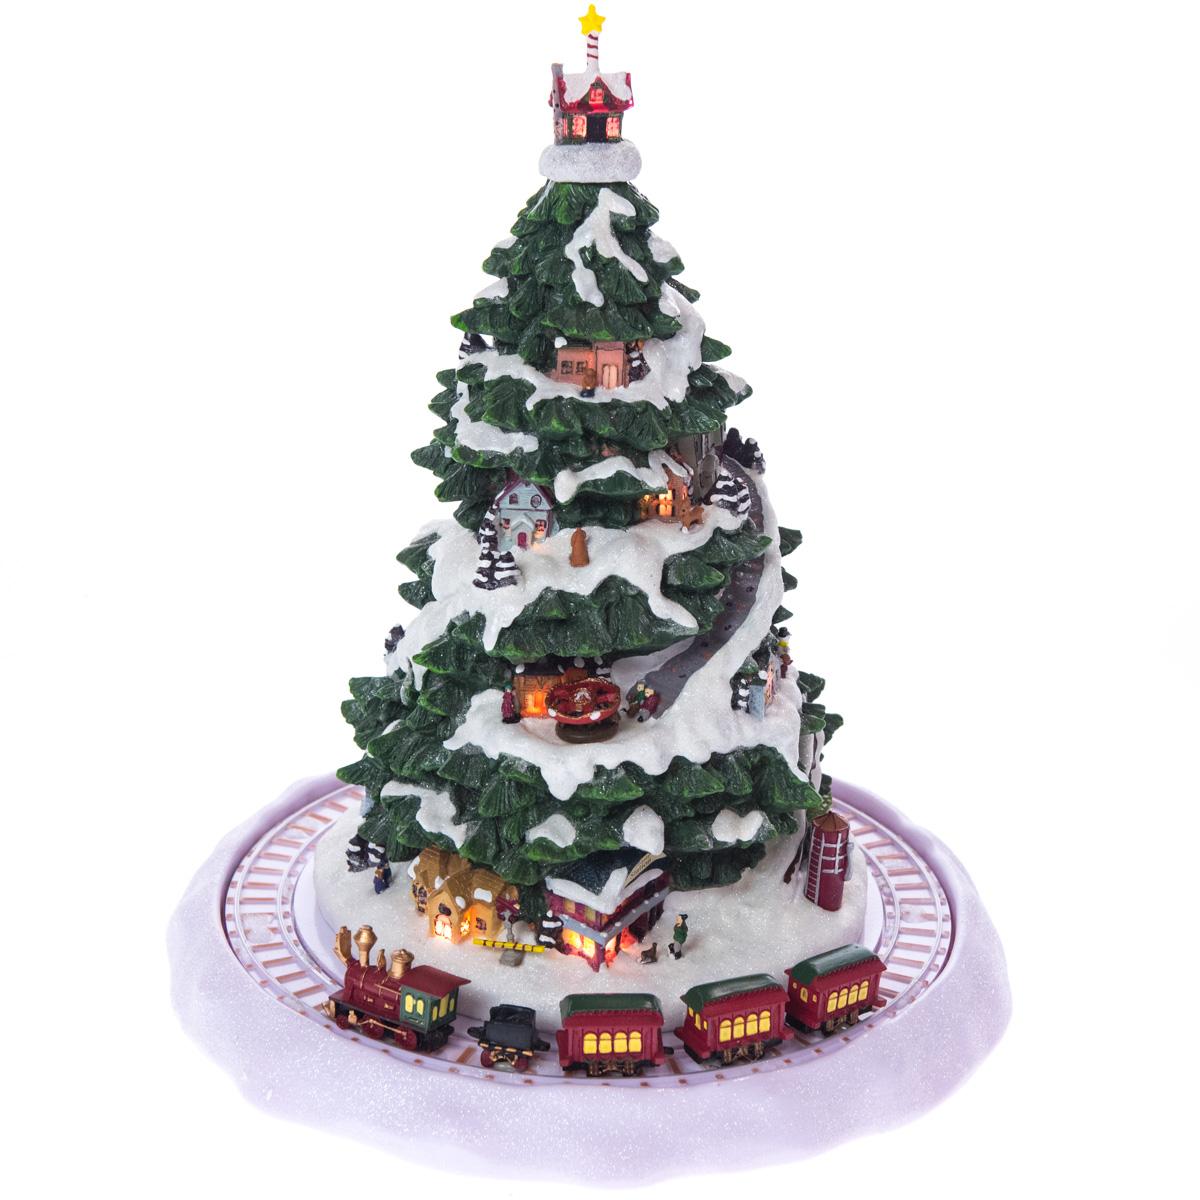 Christmas Eve Express Light-Up Musical Decor